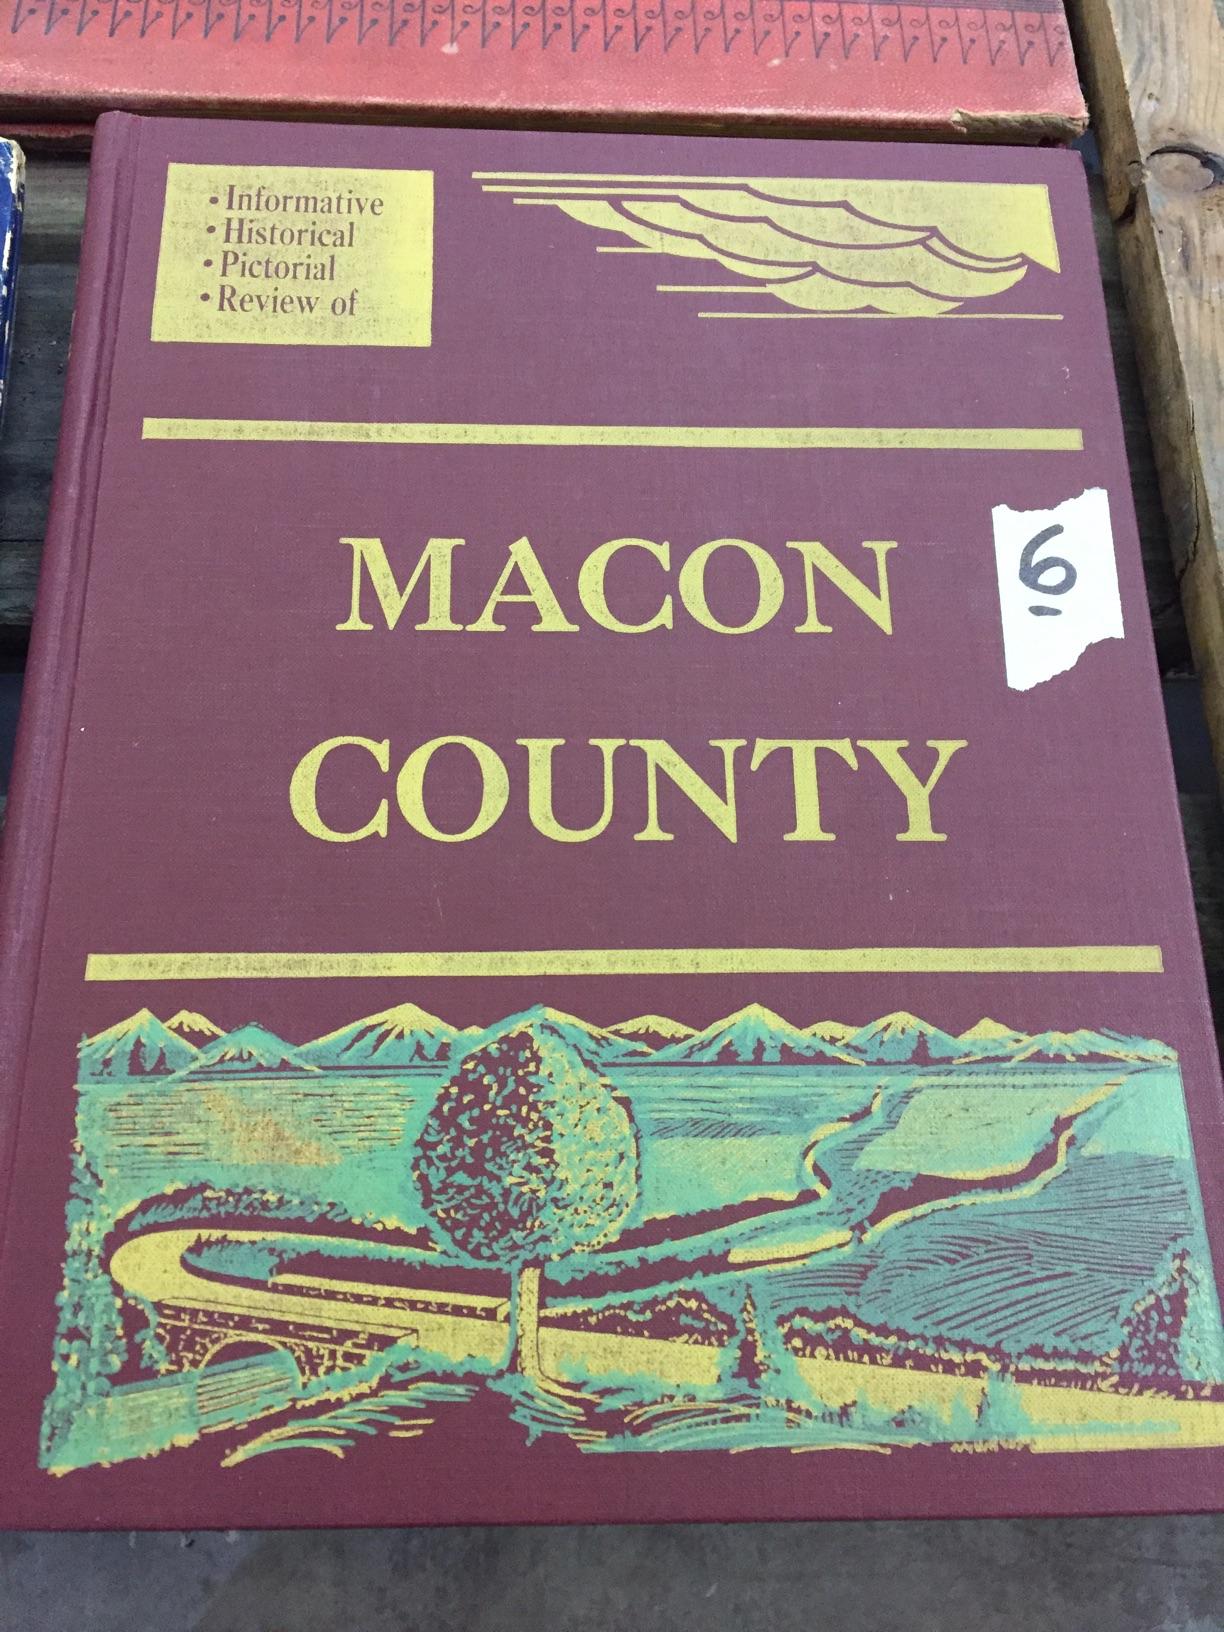 county book.JPG